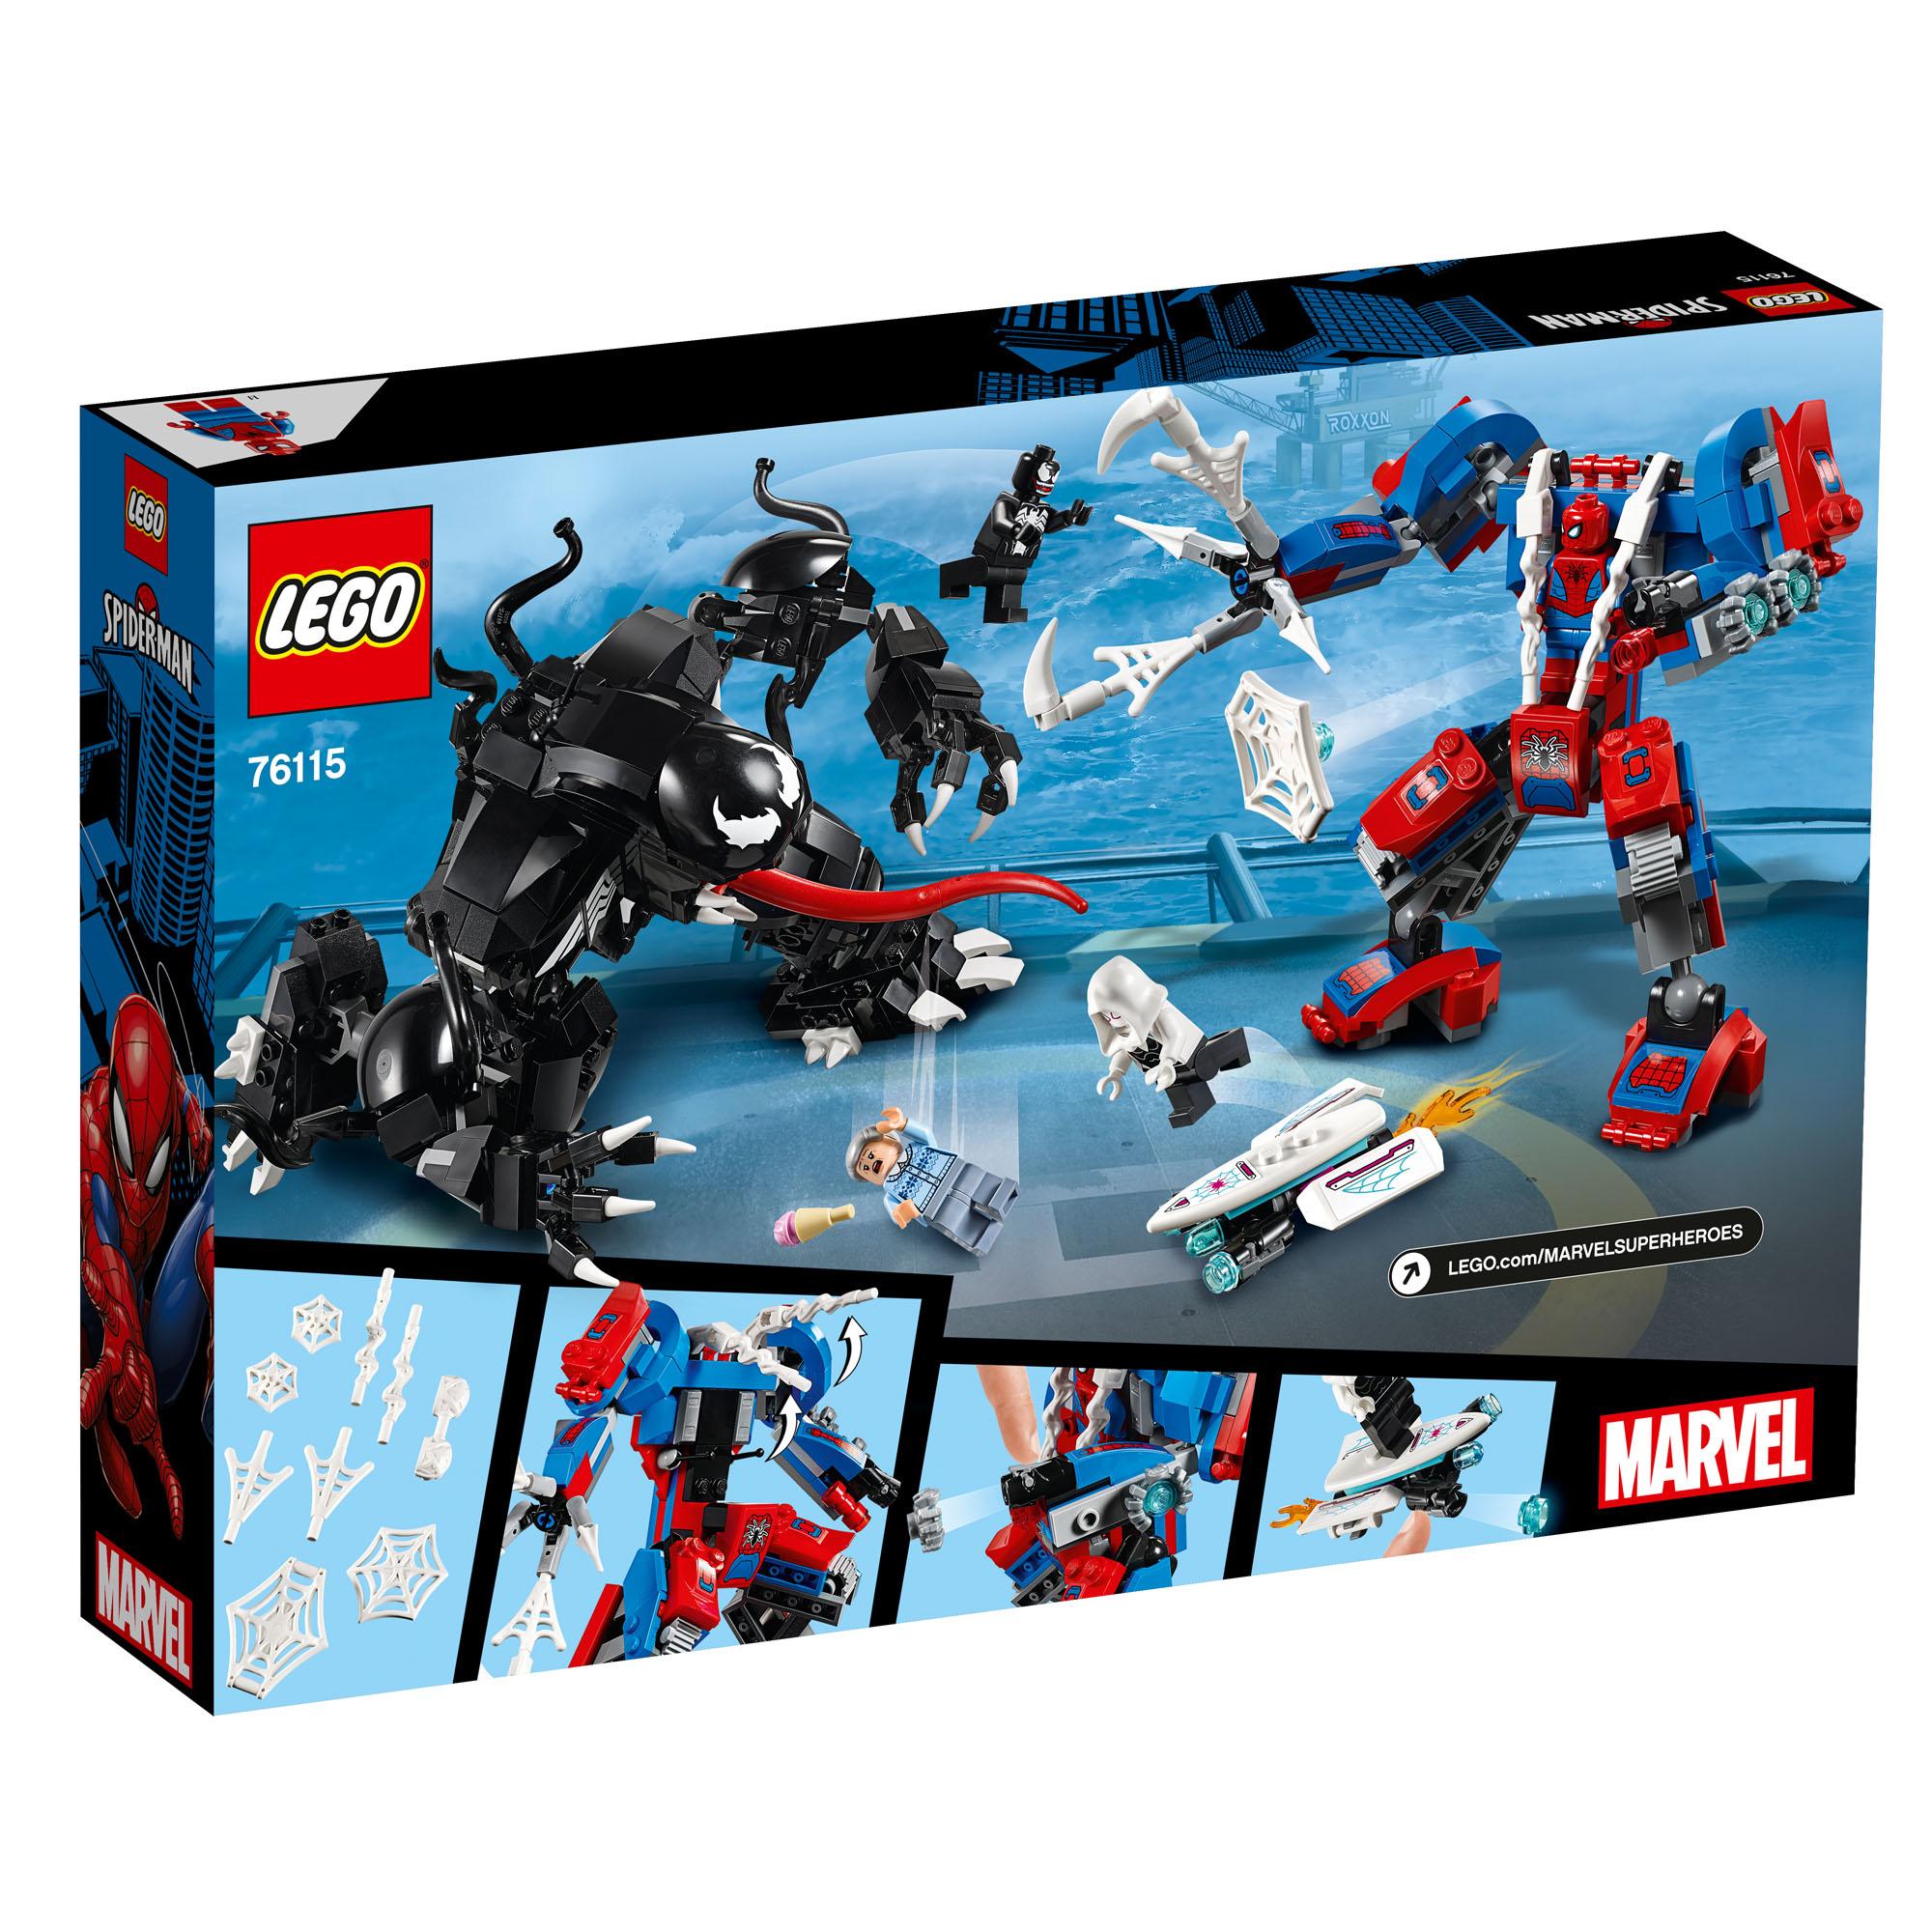 76115 LEGO Marvel Comics Super Heroes Spider Mech vs Venom 604 Pieces Age 8+